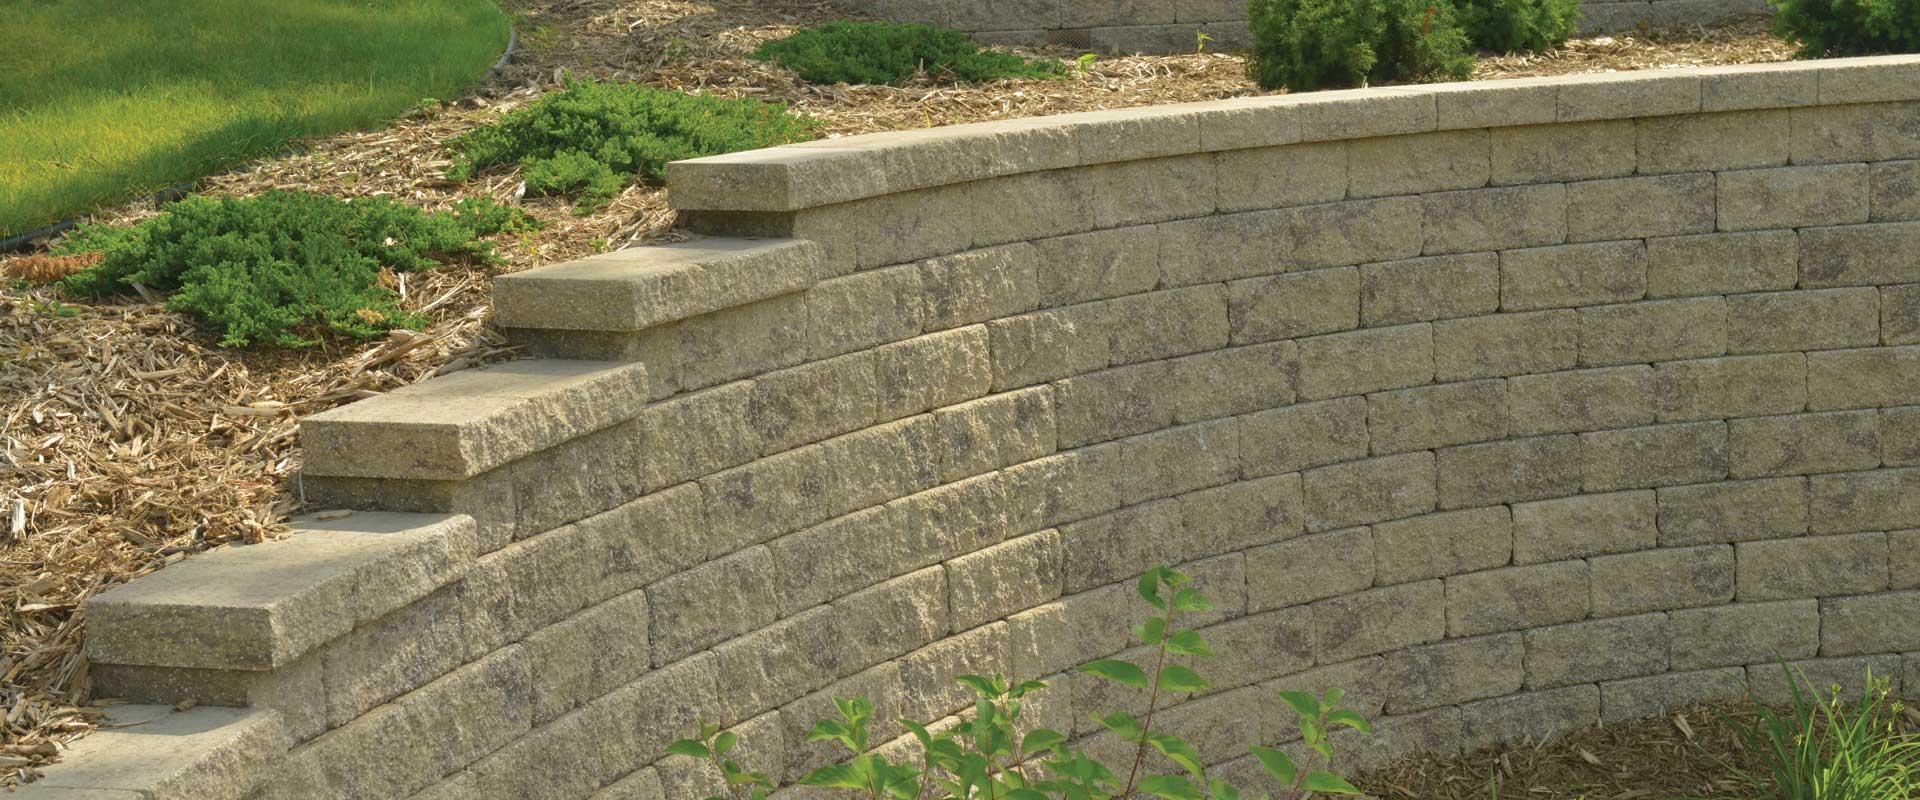 Tribute for Garden landscape retaining walls